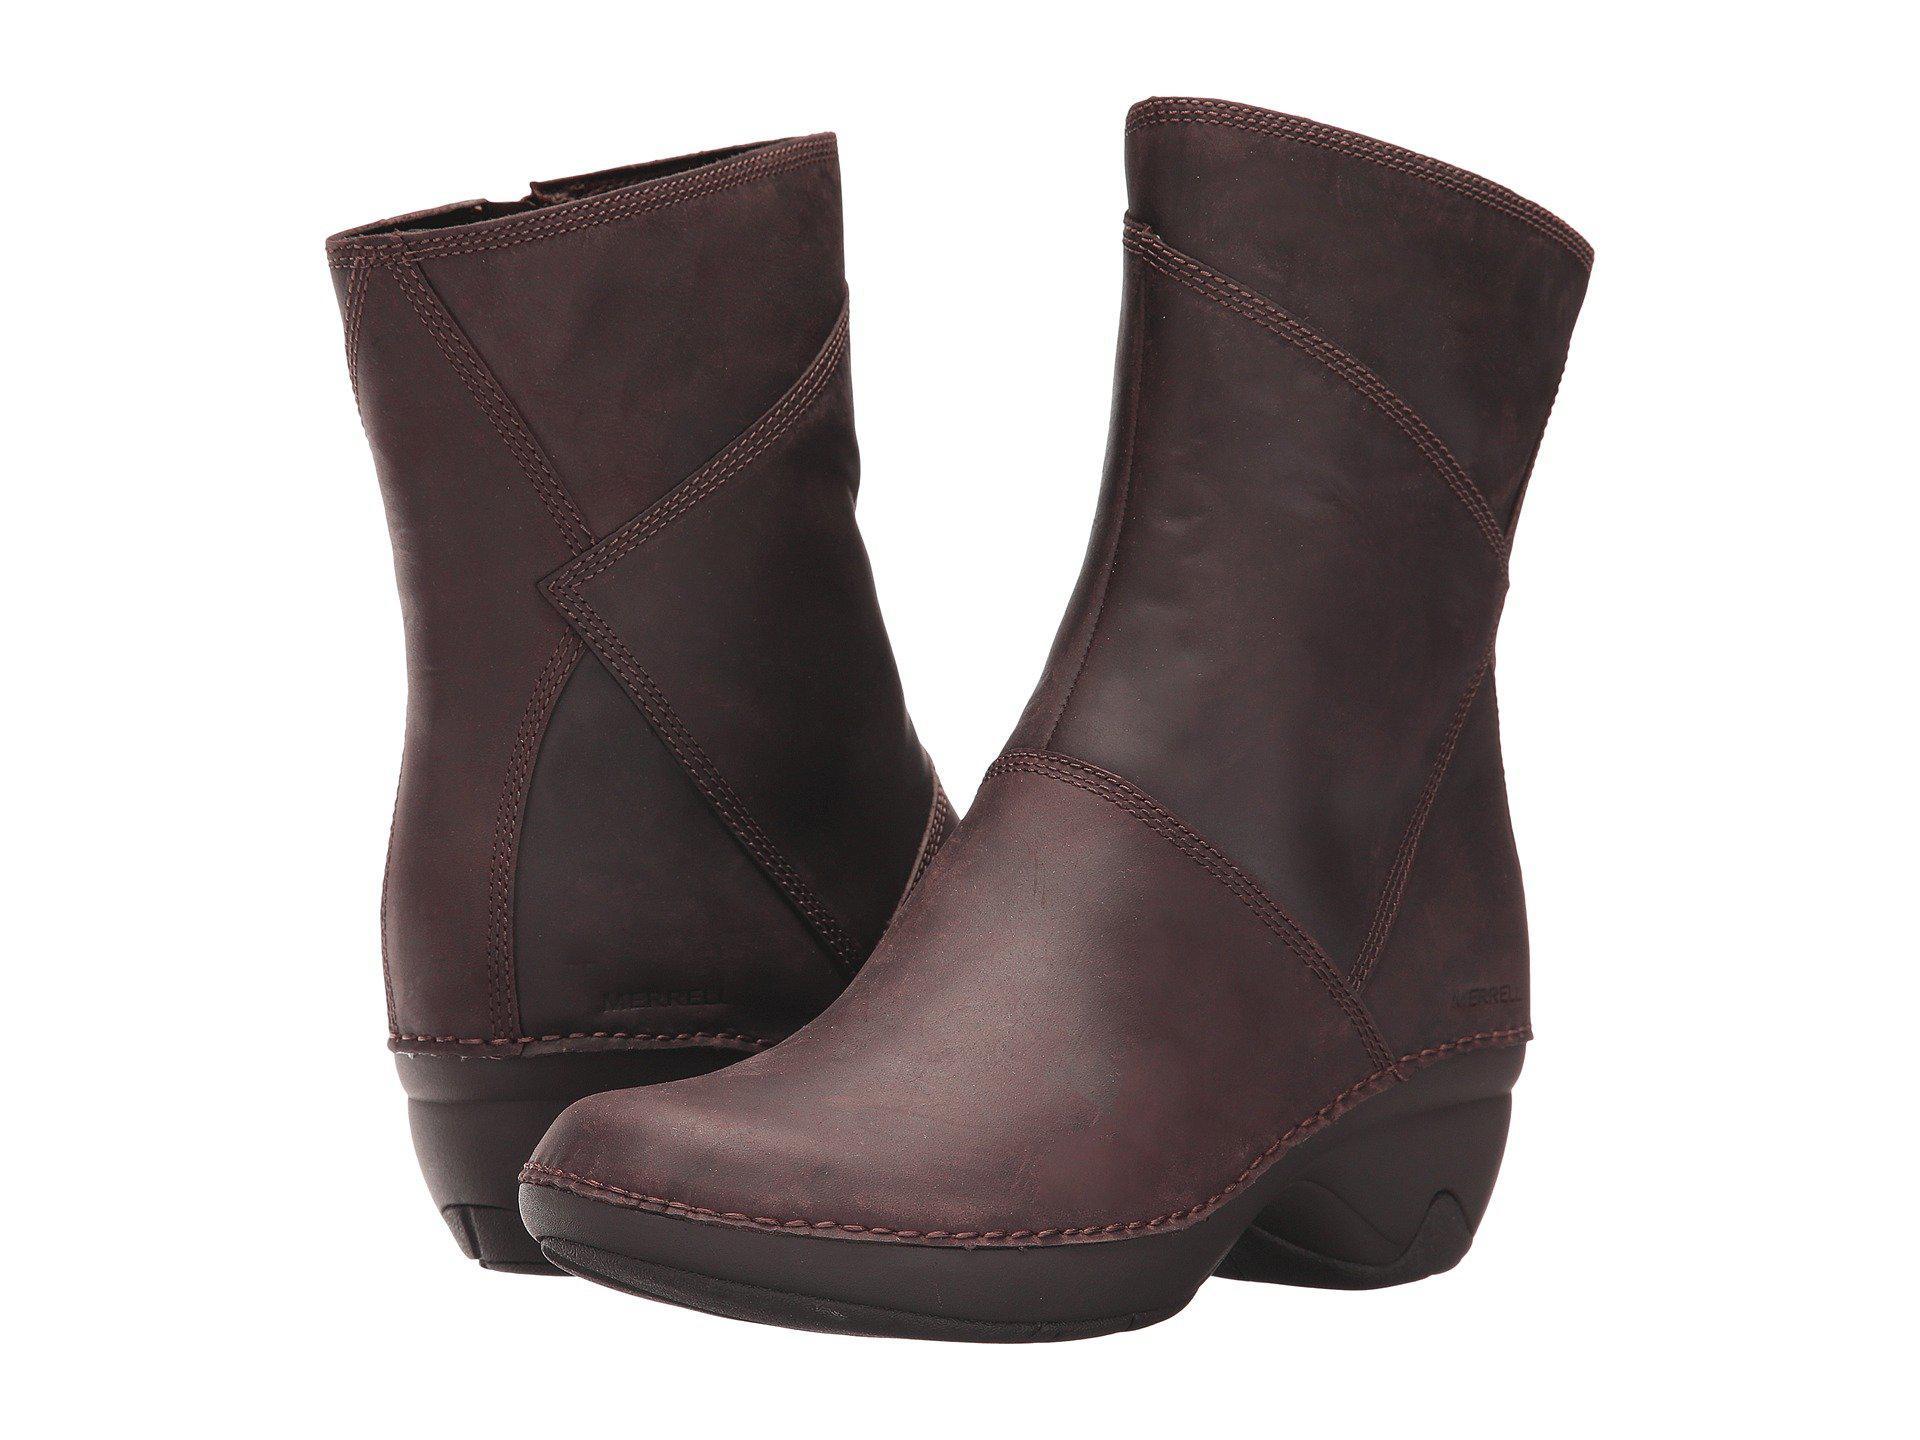 Merrell Emma Mid Leather C91YI1